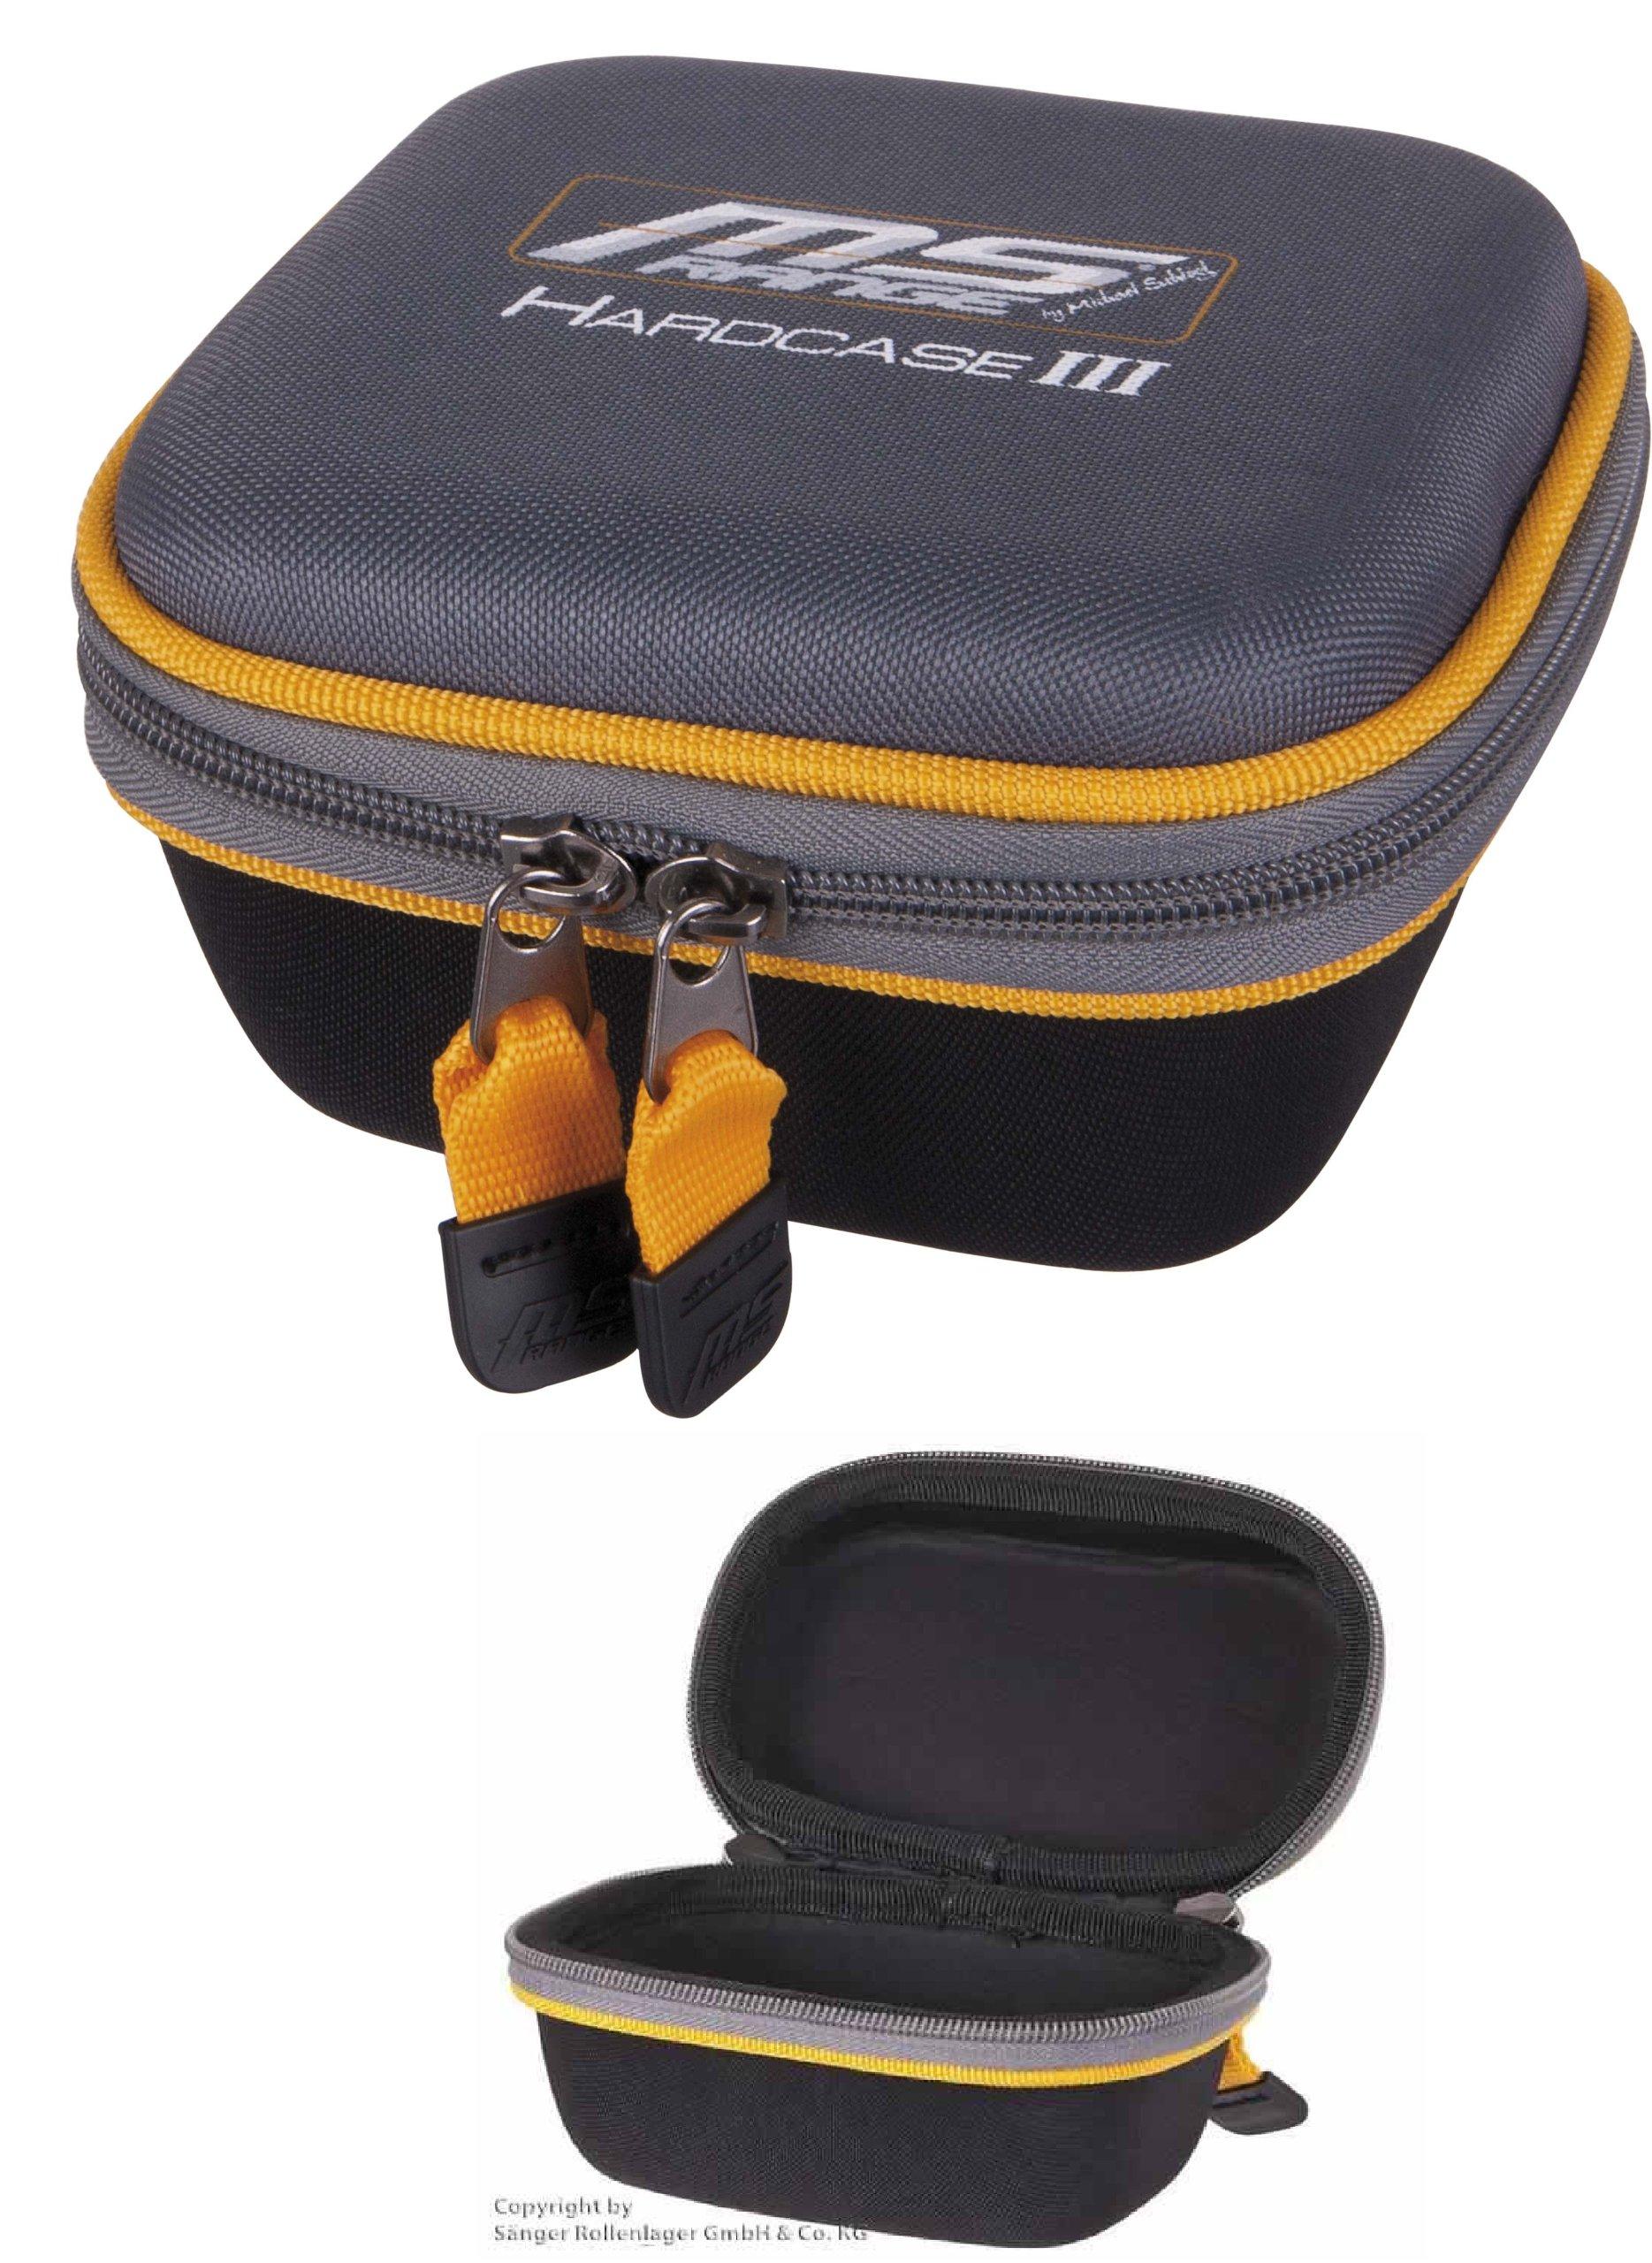 MS-Range Hardcase III–Series by Michael schloegl di borsa di Cantante